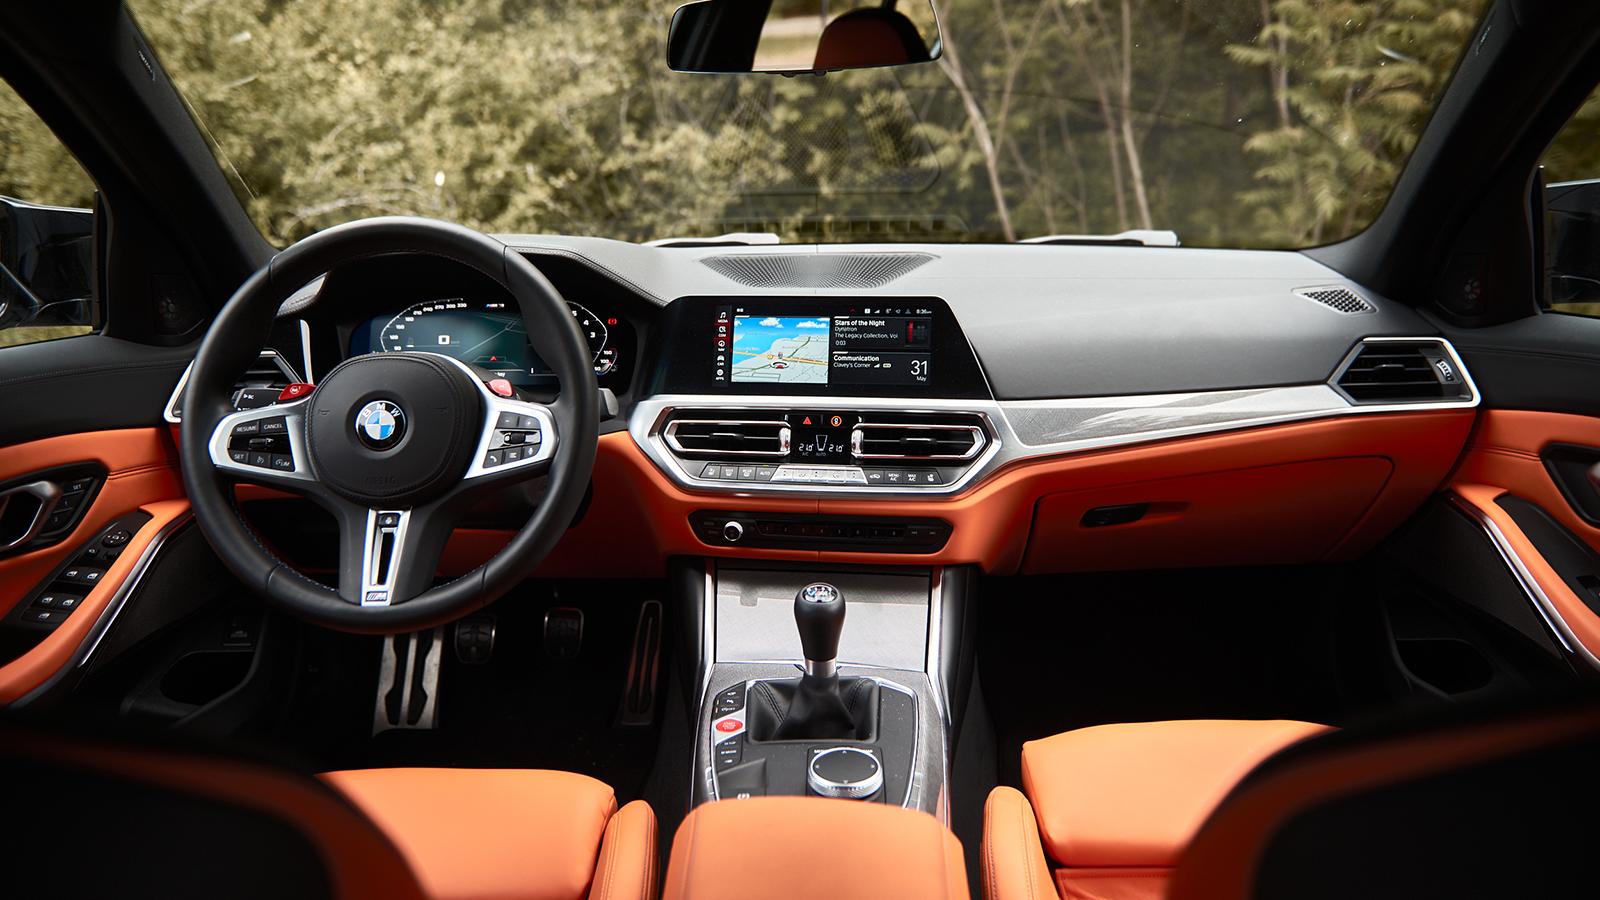 2021 BMW M3 Cockpit